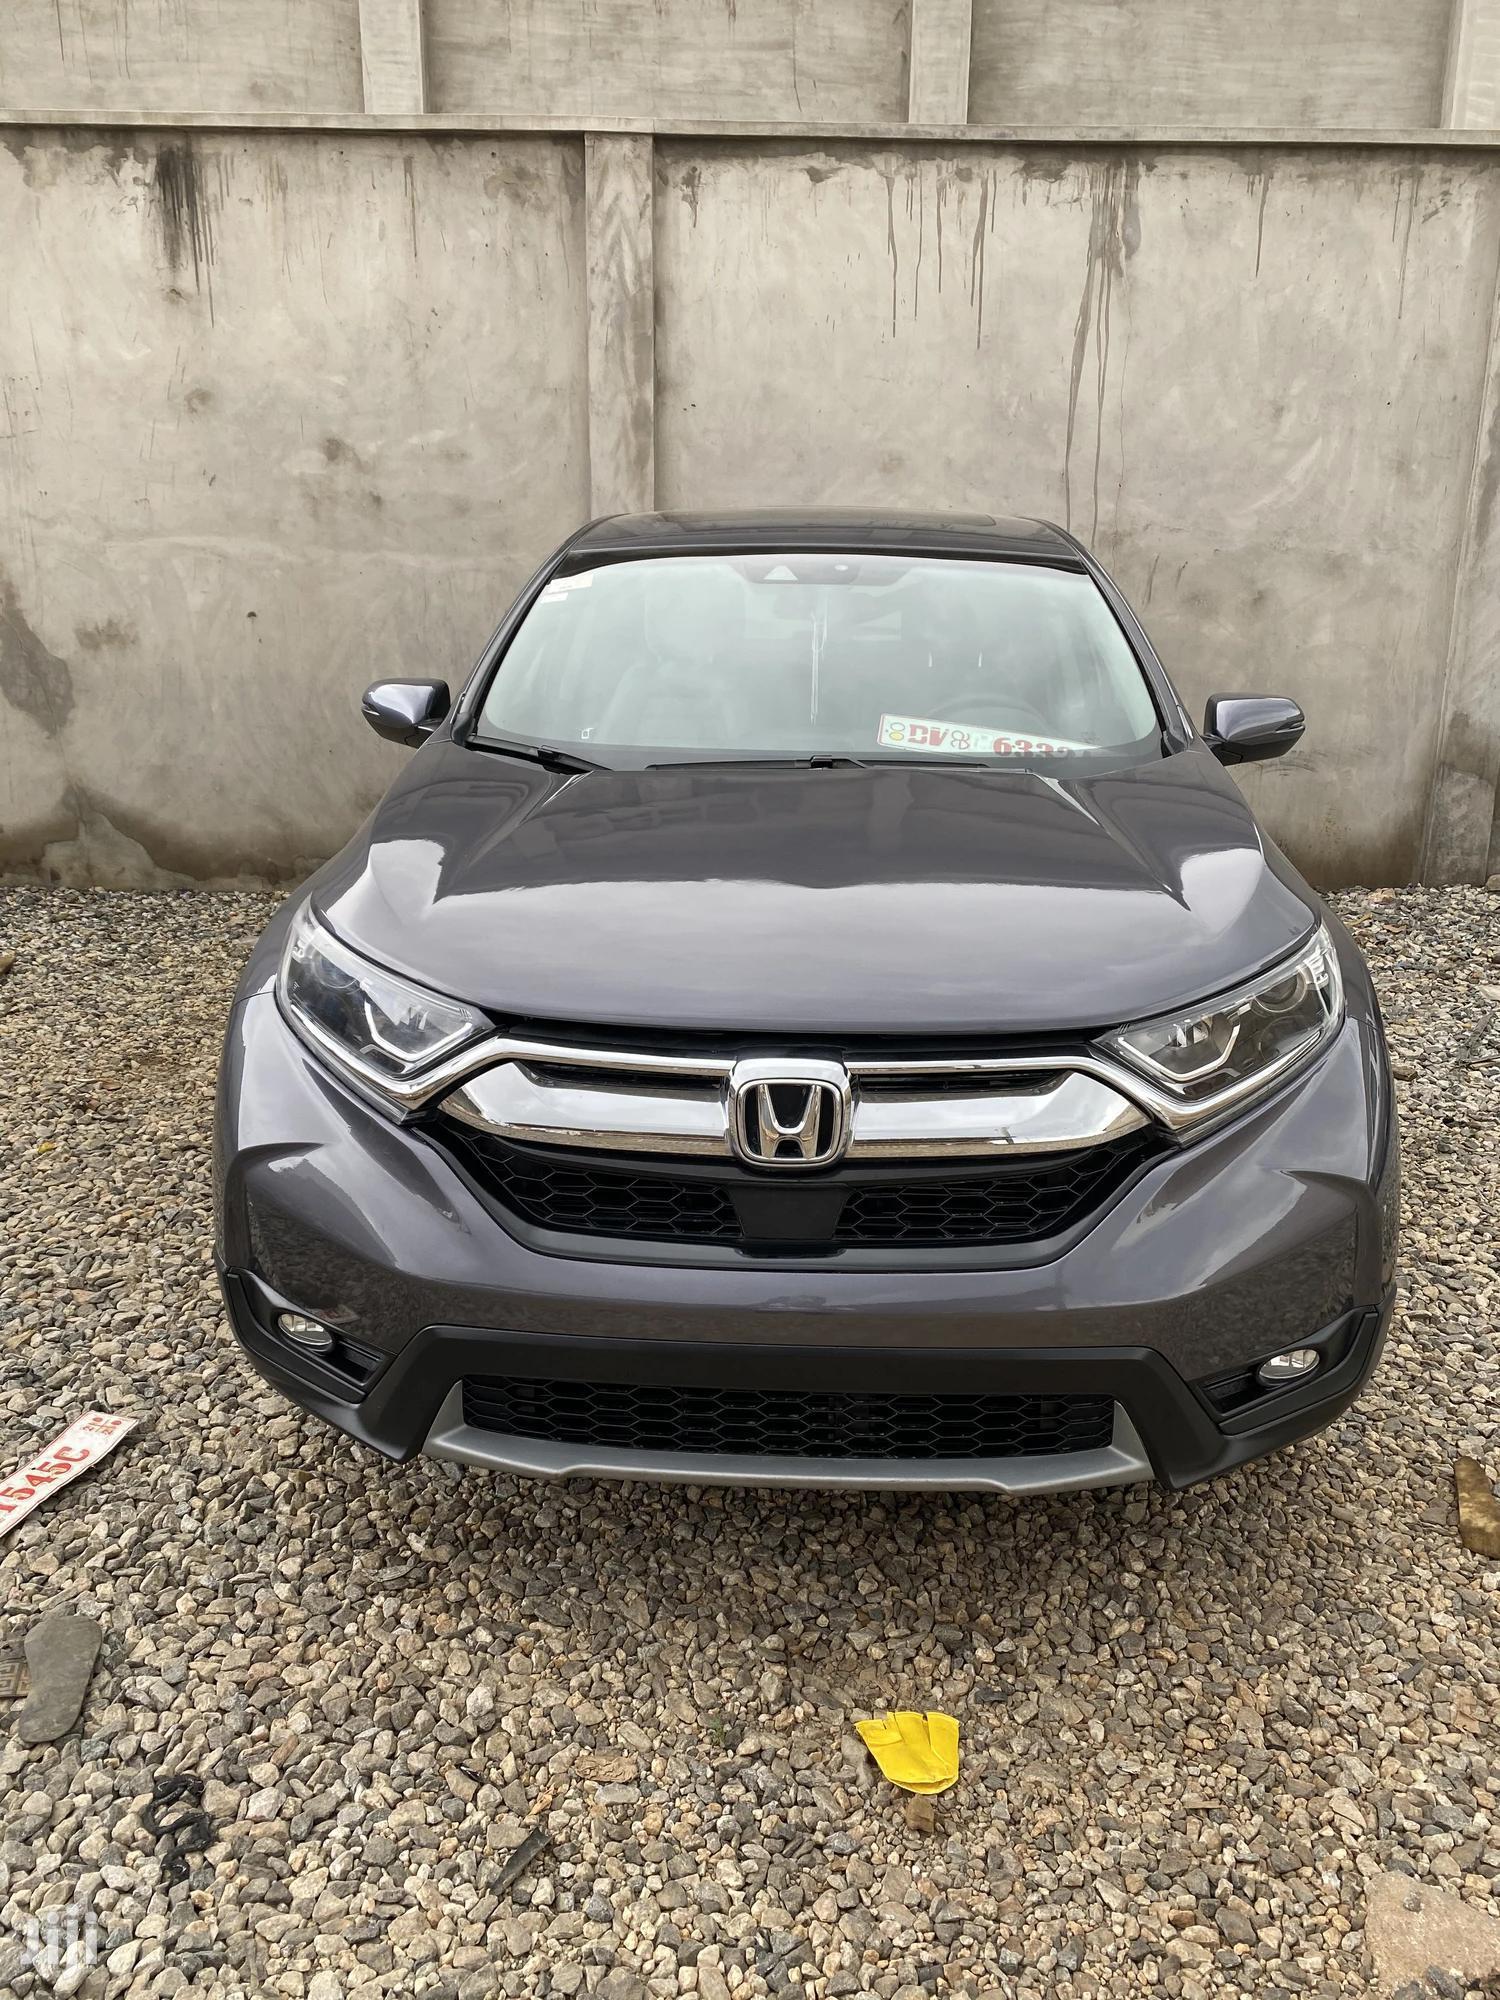 Honda CR-V 2017 Gray   Cars for sale in Dansoman, Greater Accra, Ghana